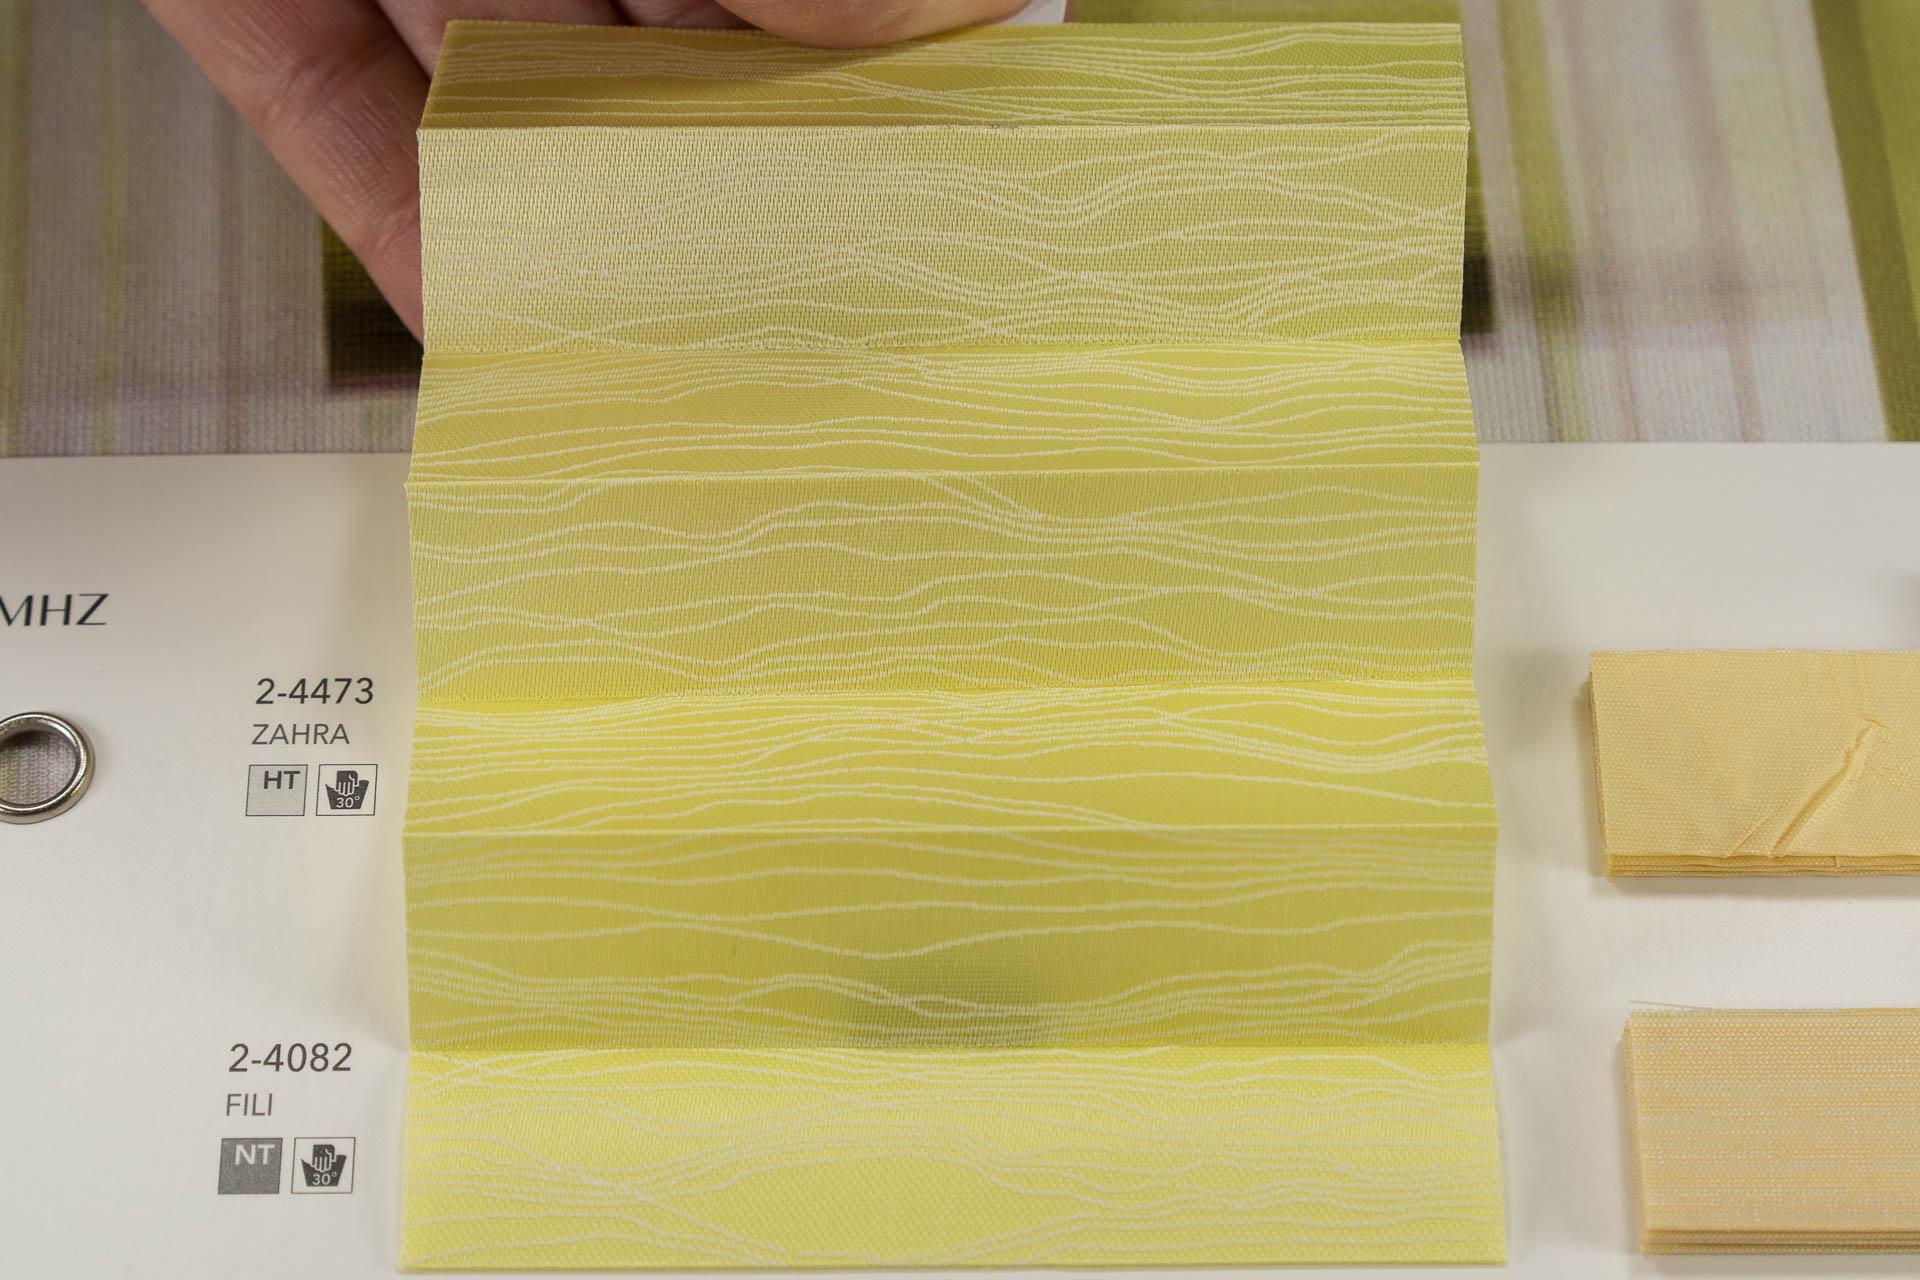 "MHZ Plissee Stoff Muster aus der Farbkarte ""13 sunny attitude"" | Material: 100 % PES"